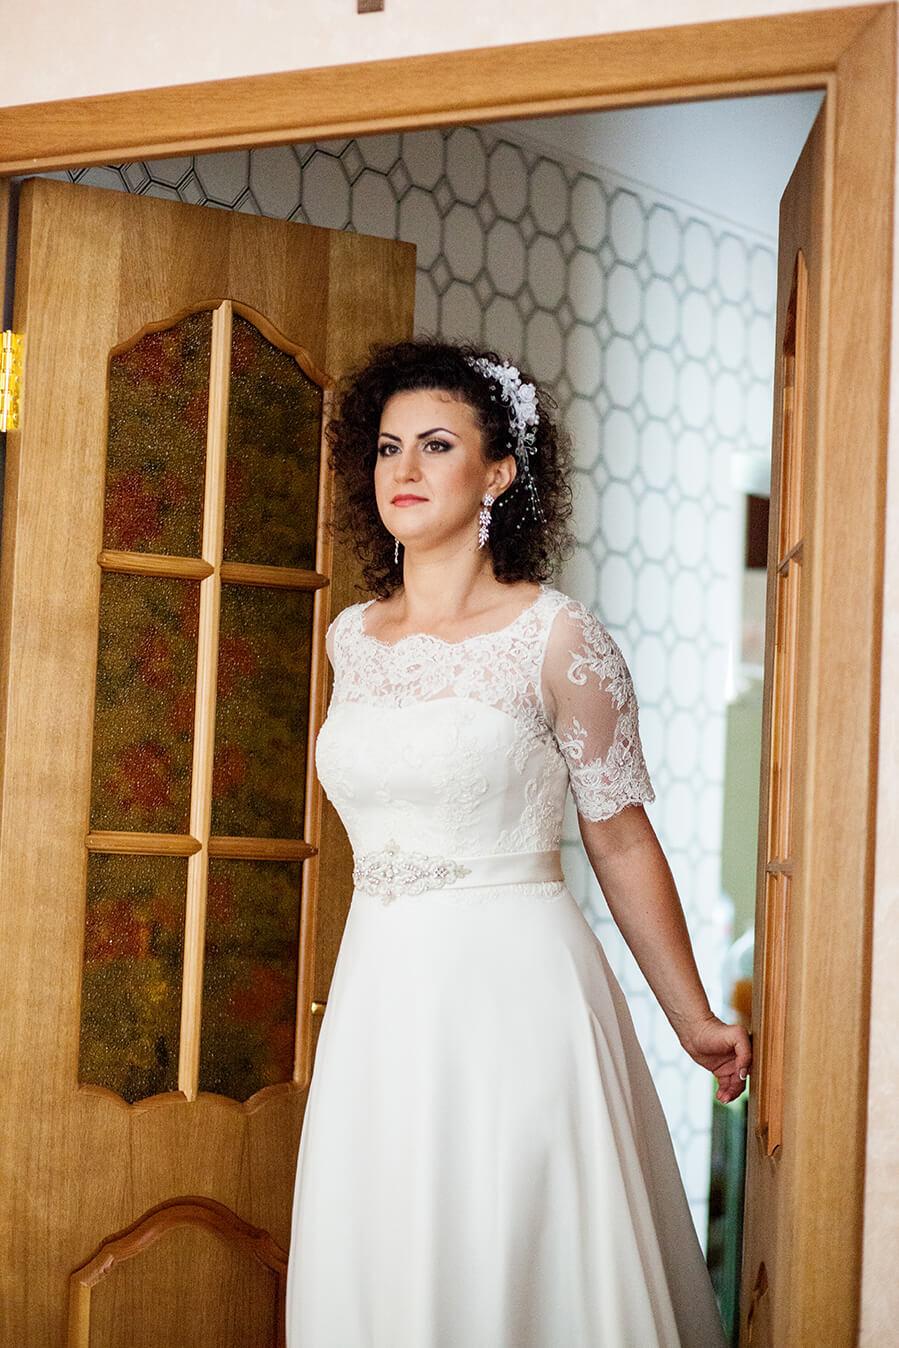 2-svadebnyj-fotograf-videooperator-svadebnoe-foto-utro-nevesty-idei-kiev-3